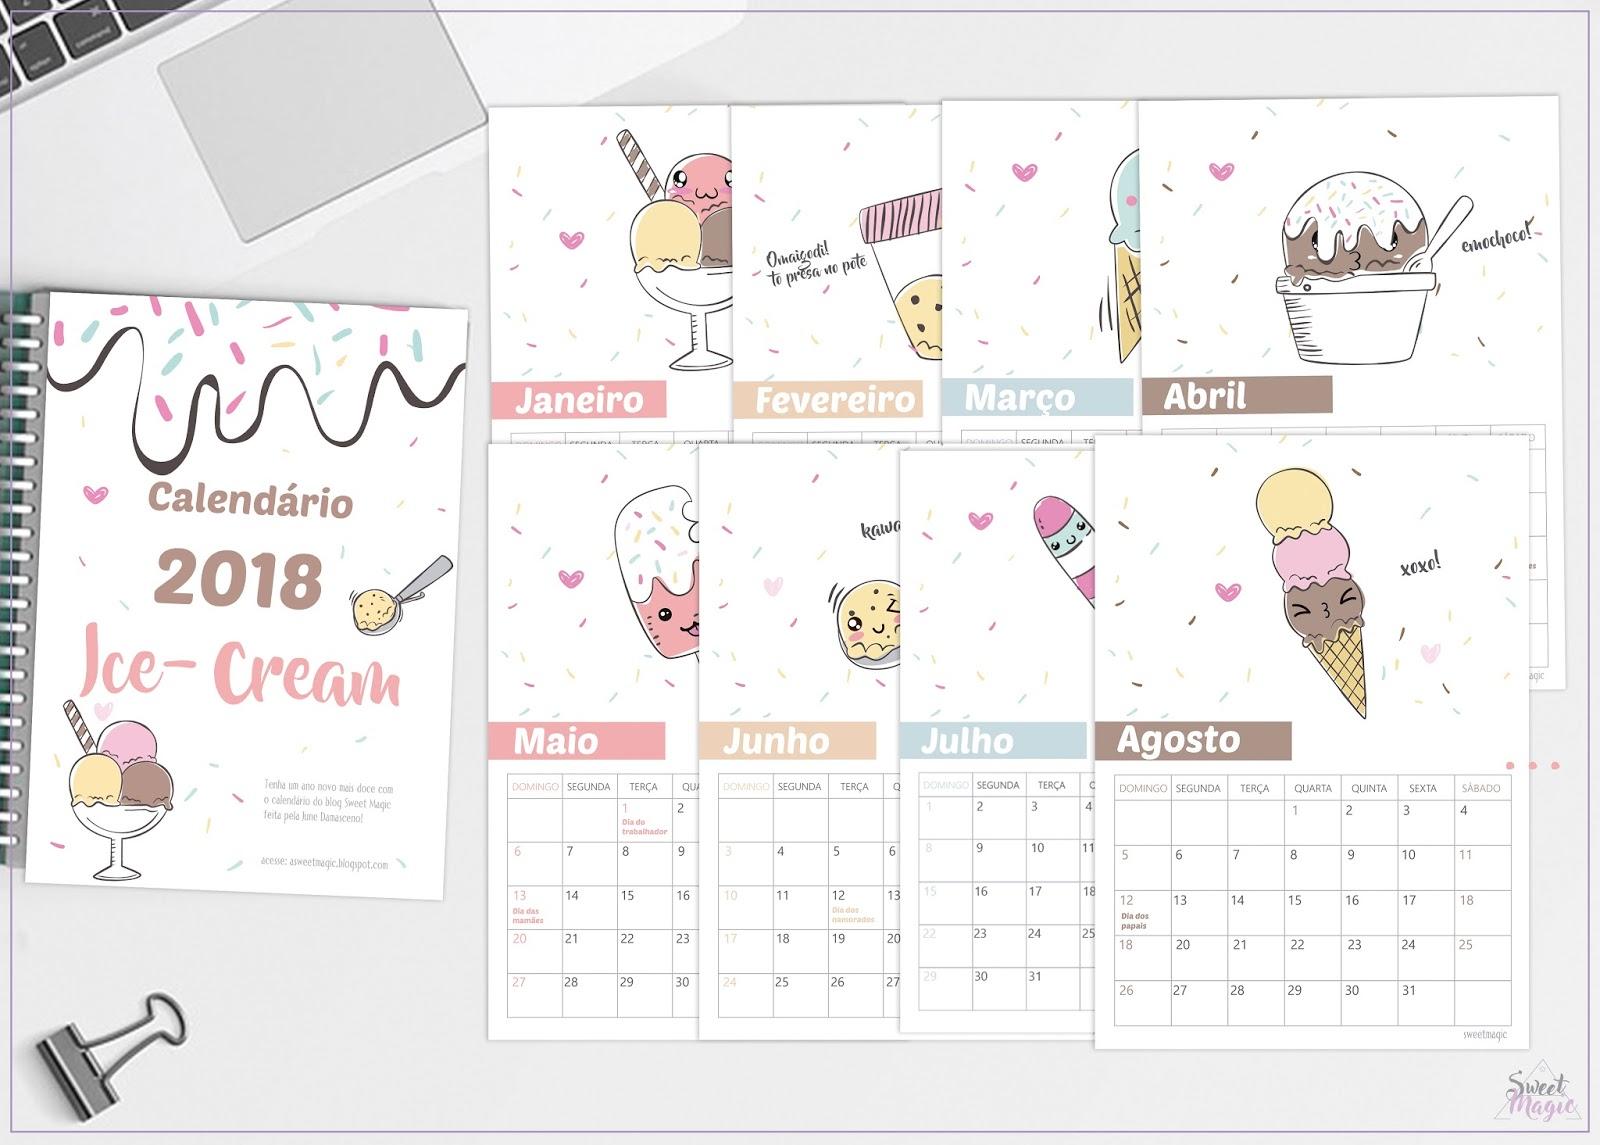 Calendario 2018 Para Imprimir Pdf - takvim kalender HD